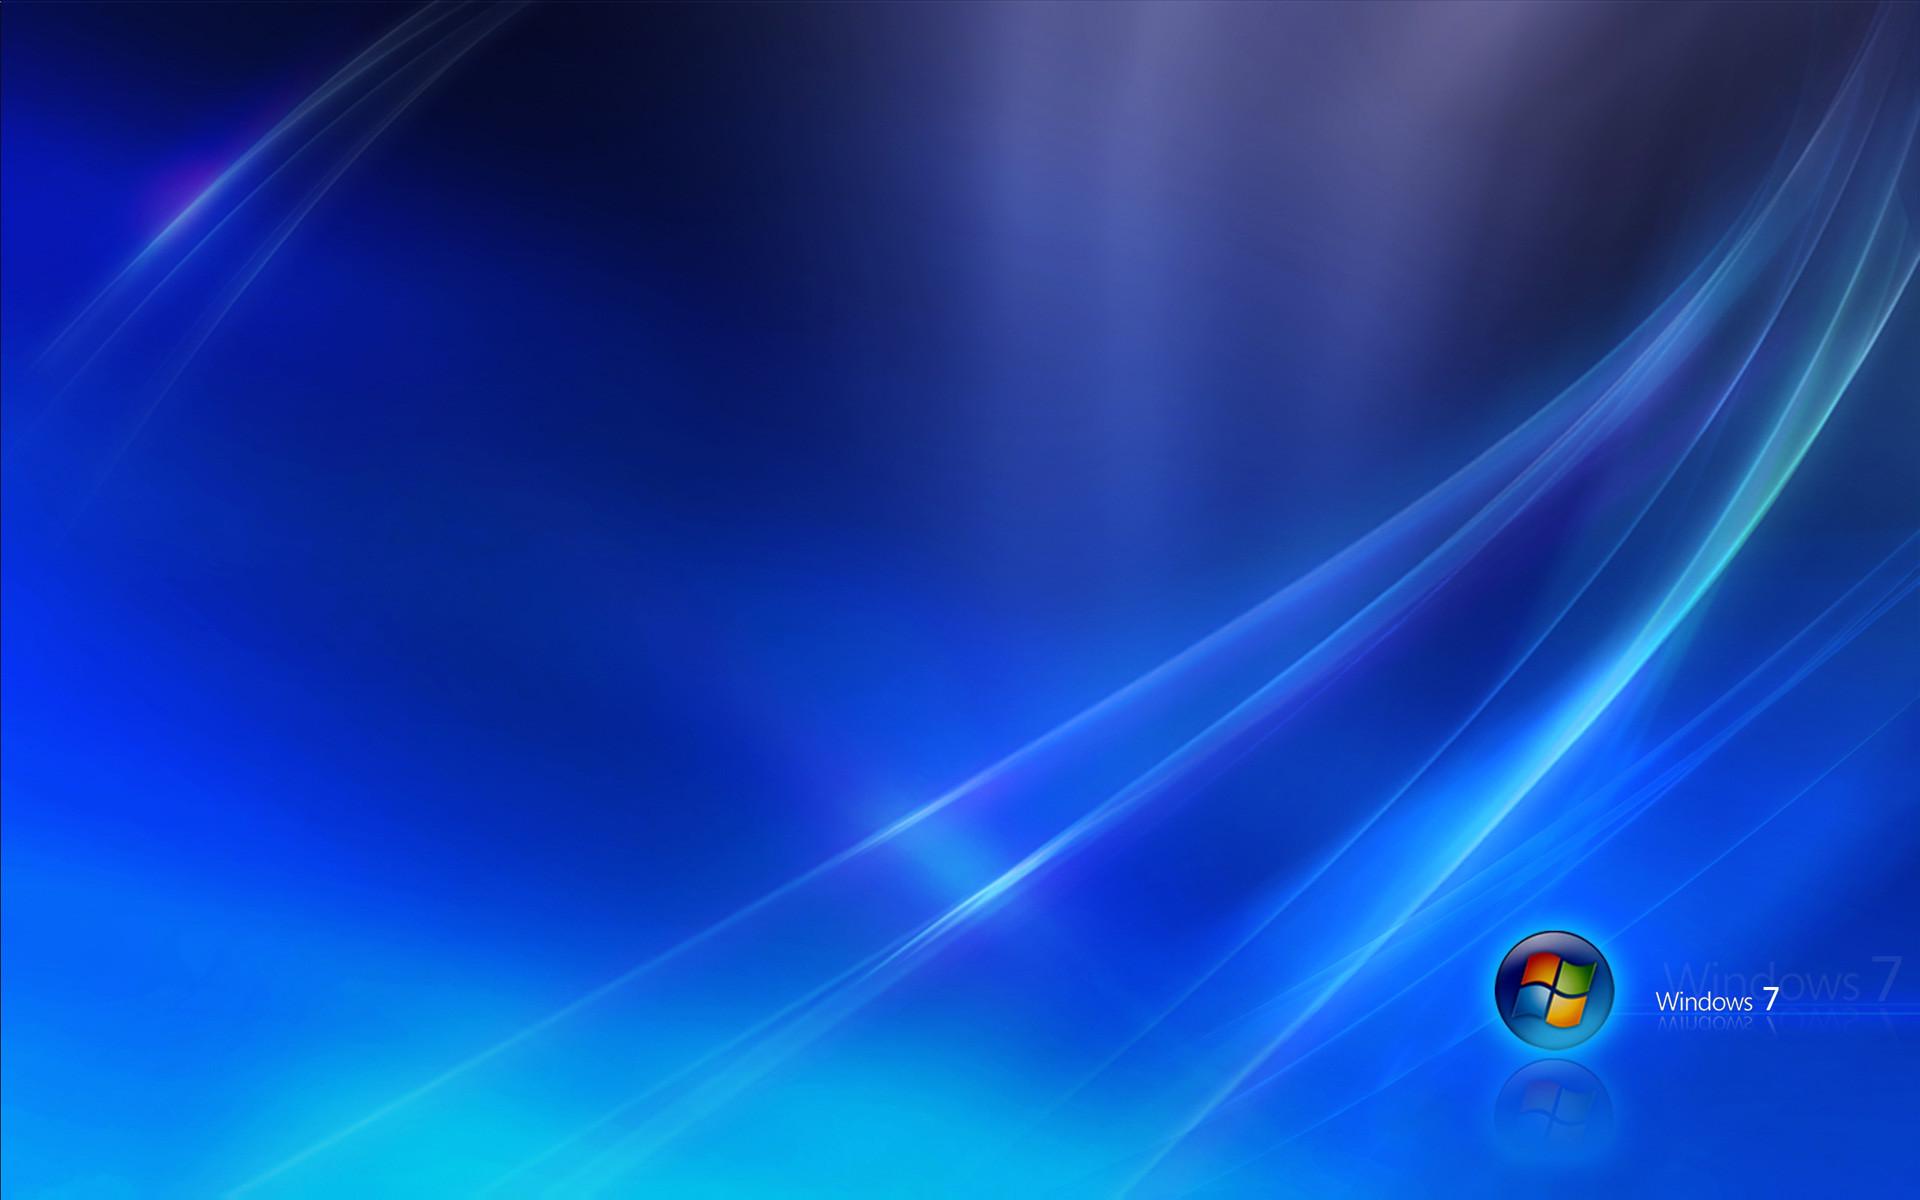 Microsoft Windows Backgrounds Themes Free wallpaper download 2560×1440  Windows 7 Backgrounds Themes (49